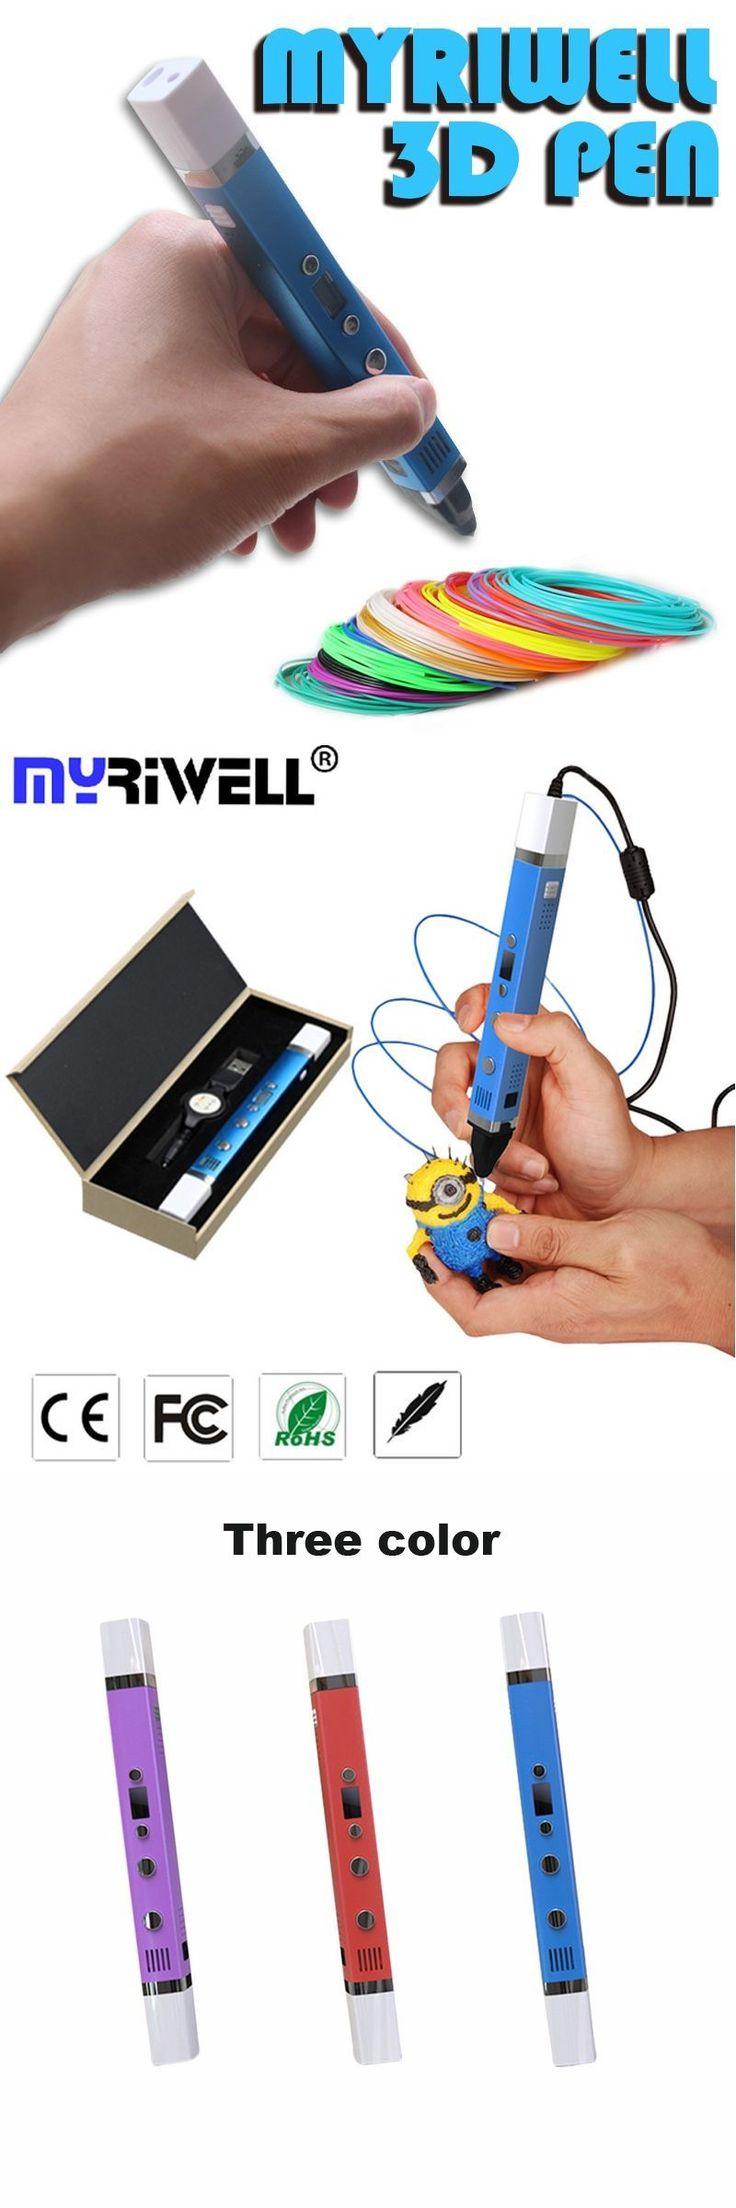 Myriwell Original Magic 3d printer pen Drawing 3D Pen with LED screen 3D impresora 3d pens for kids birthday present Useful gift #3ddrawings #3dprinterkids